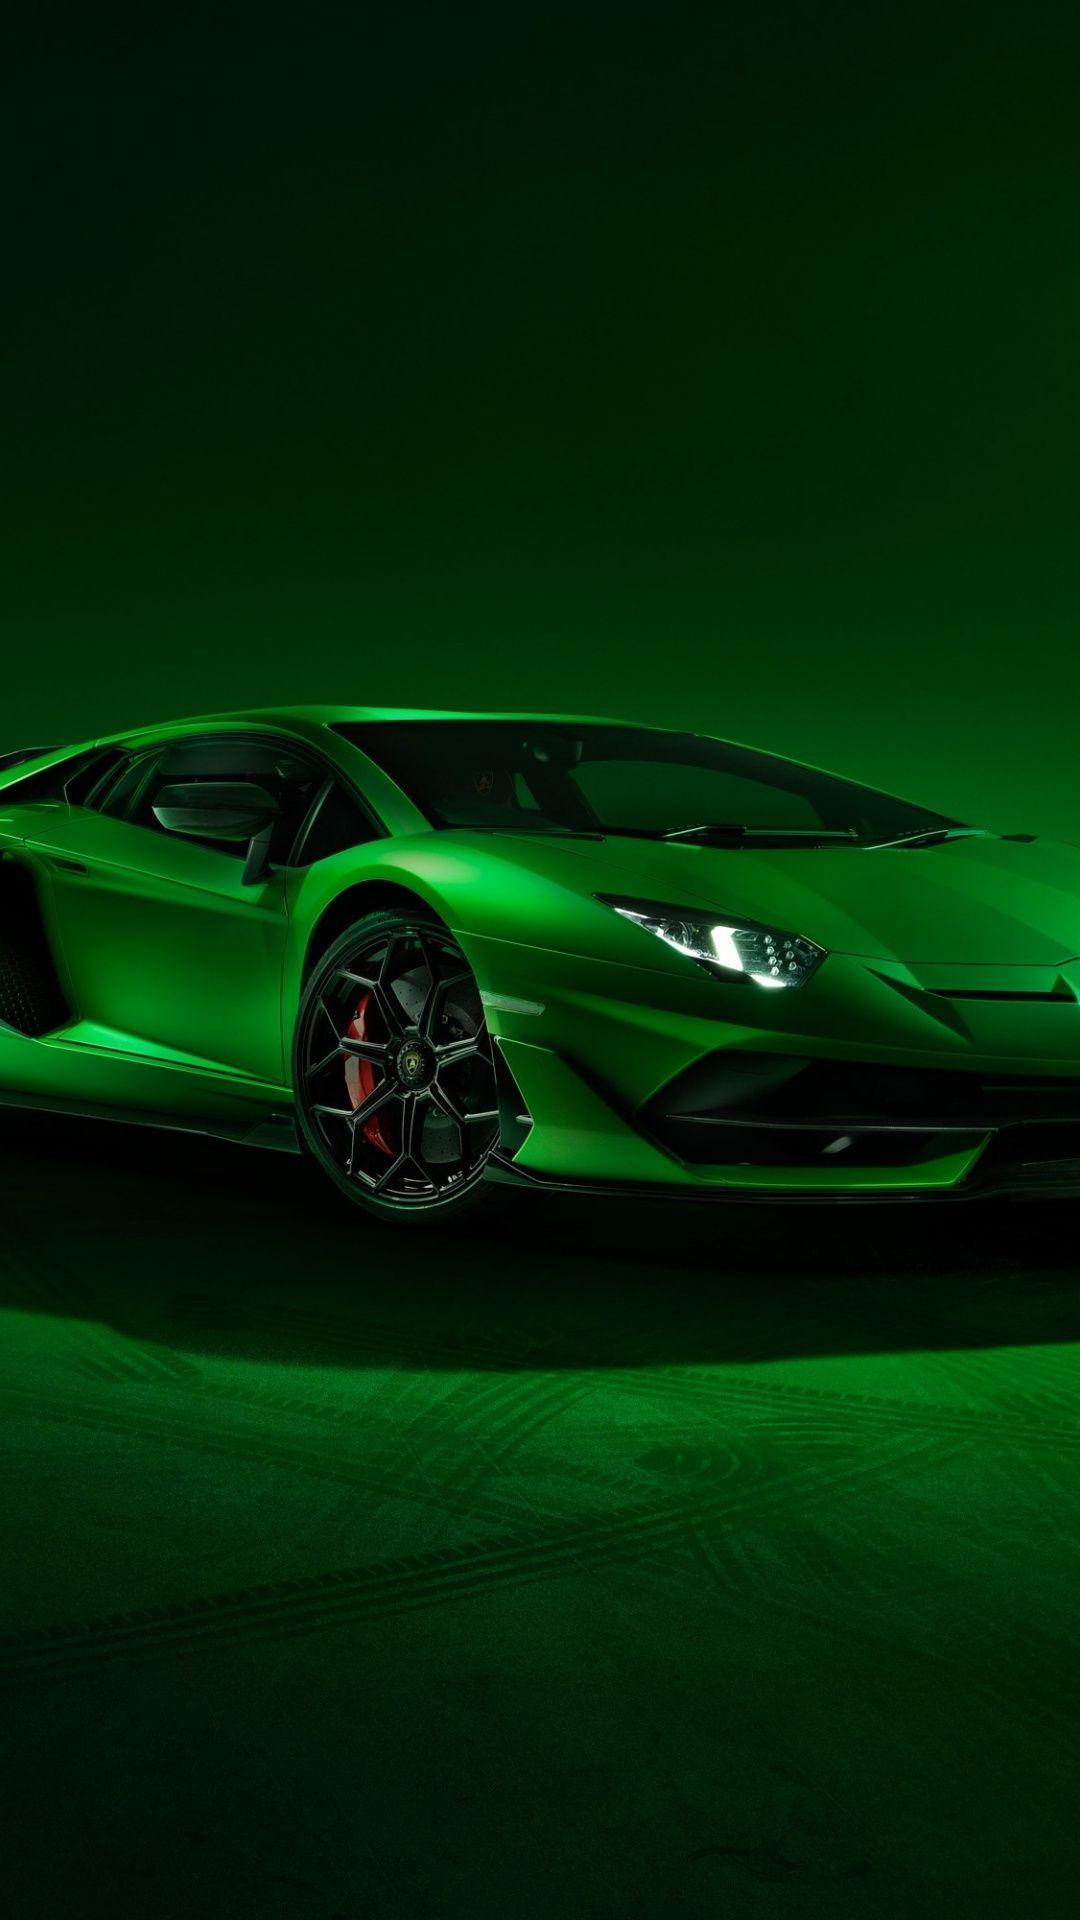 Green Lamborghini Iphone Wallpapers Top Free Green